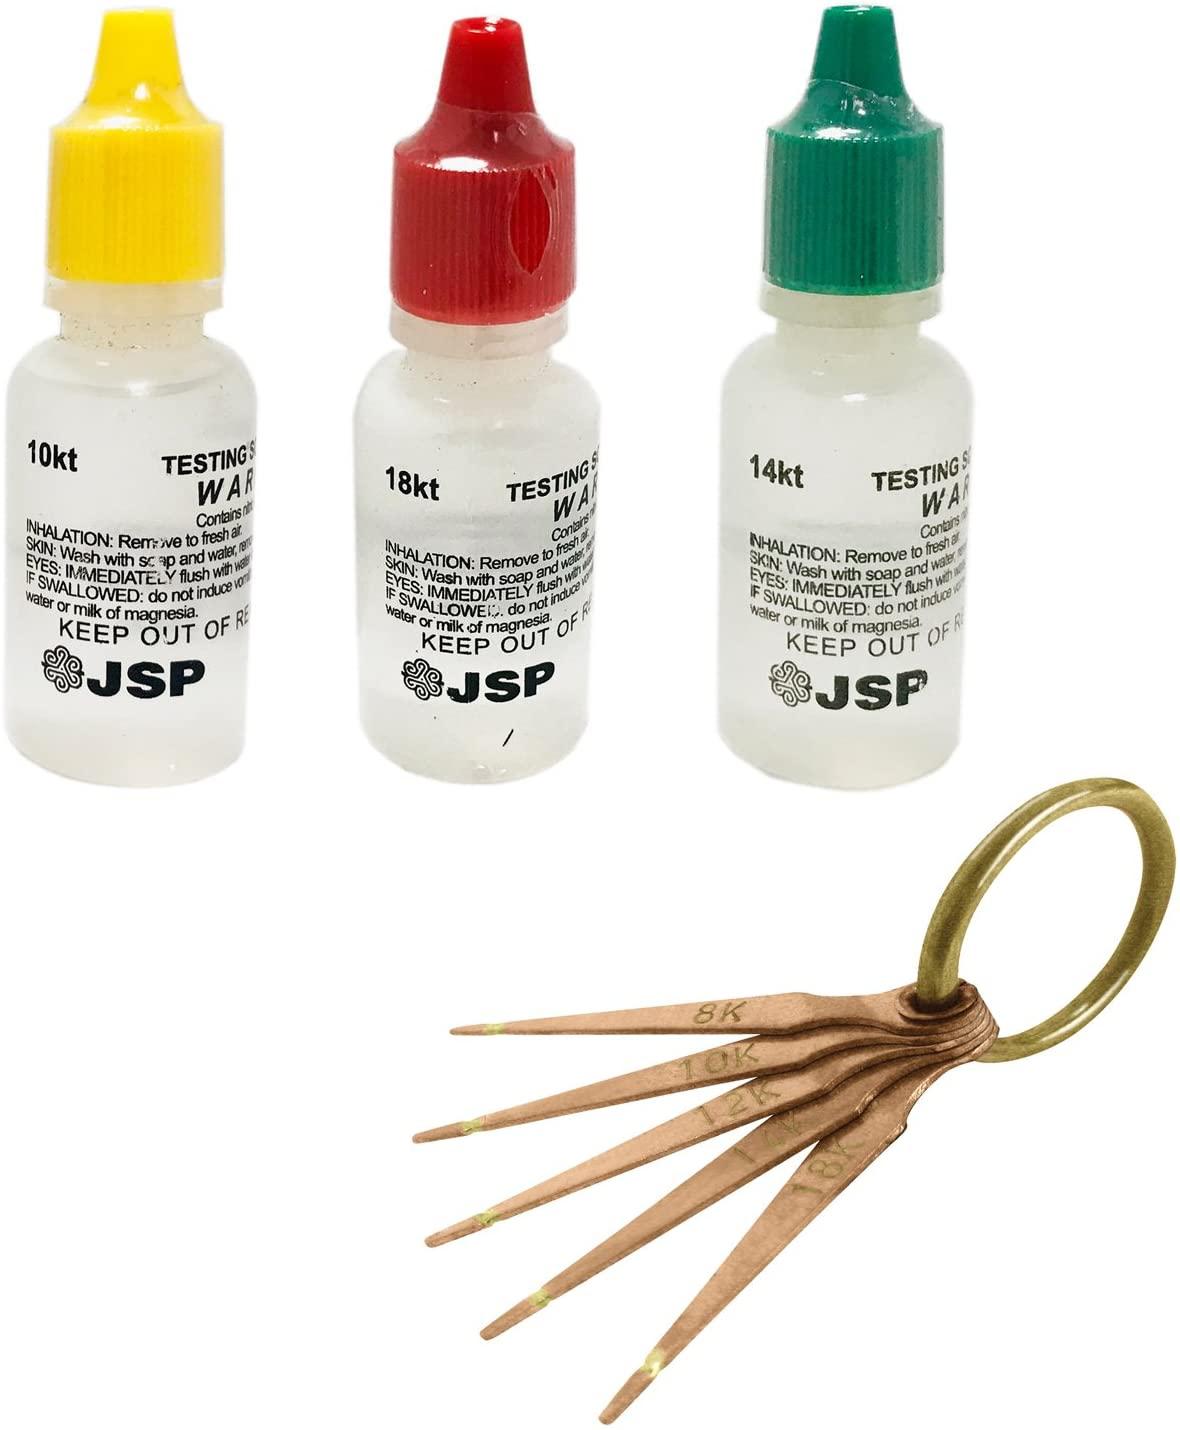 3 PCS JSP Gold Testing Solutions 10K 14K 18K and Gold Test Needles 5 Prong